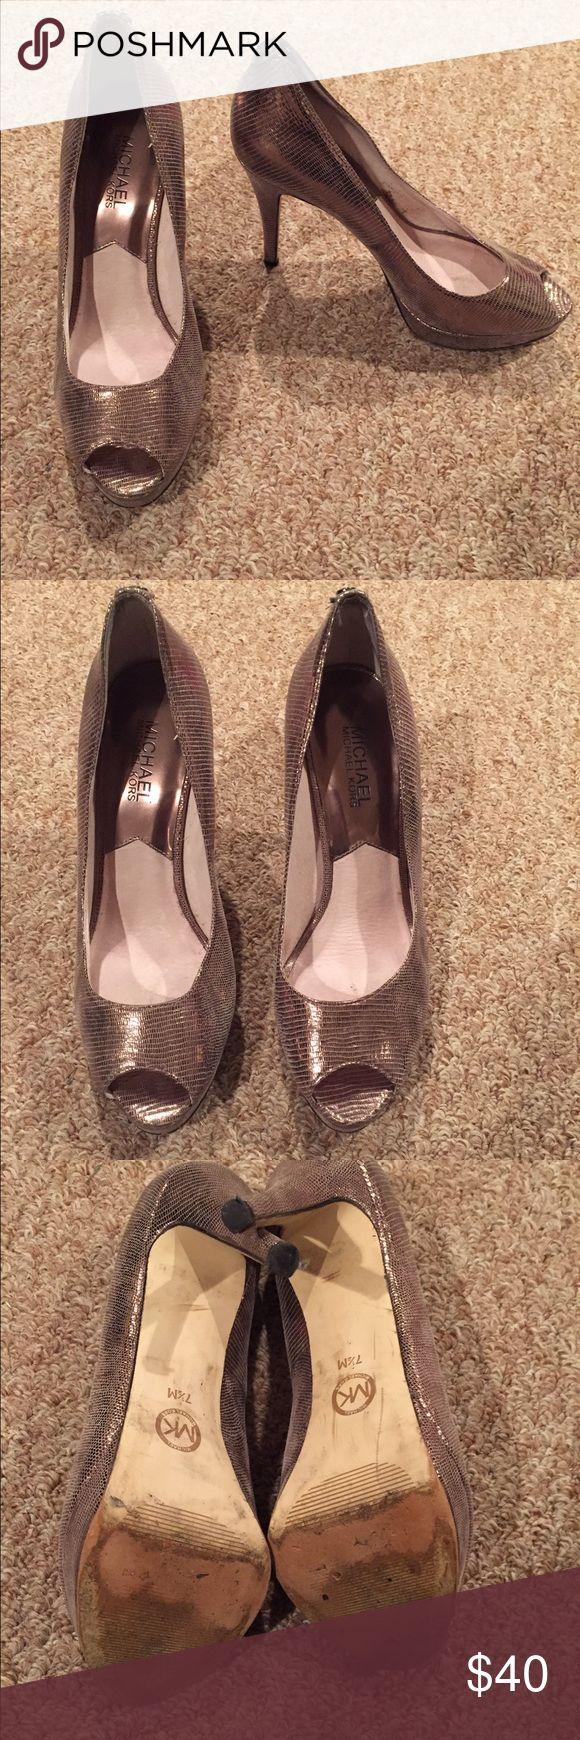 Silver Michael Kors Heels Silver Michael Kors Heels. EUC! Michael Kors Shoes Heels